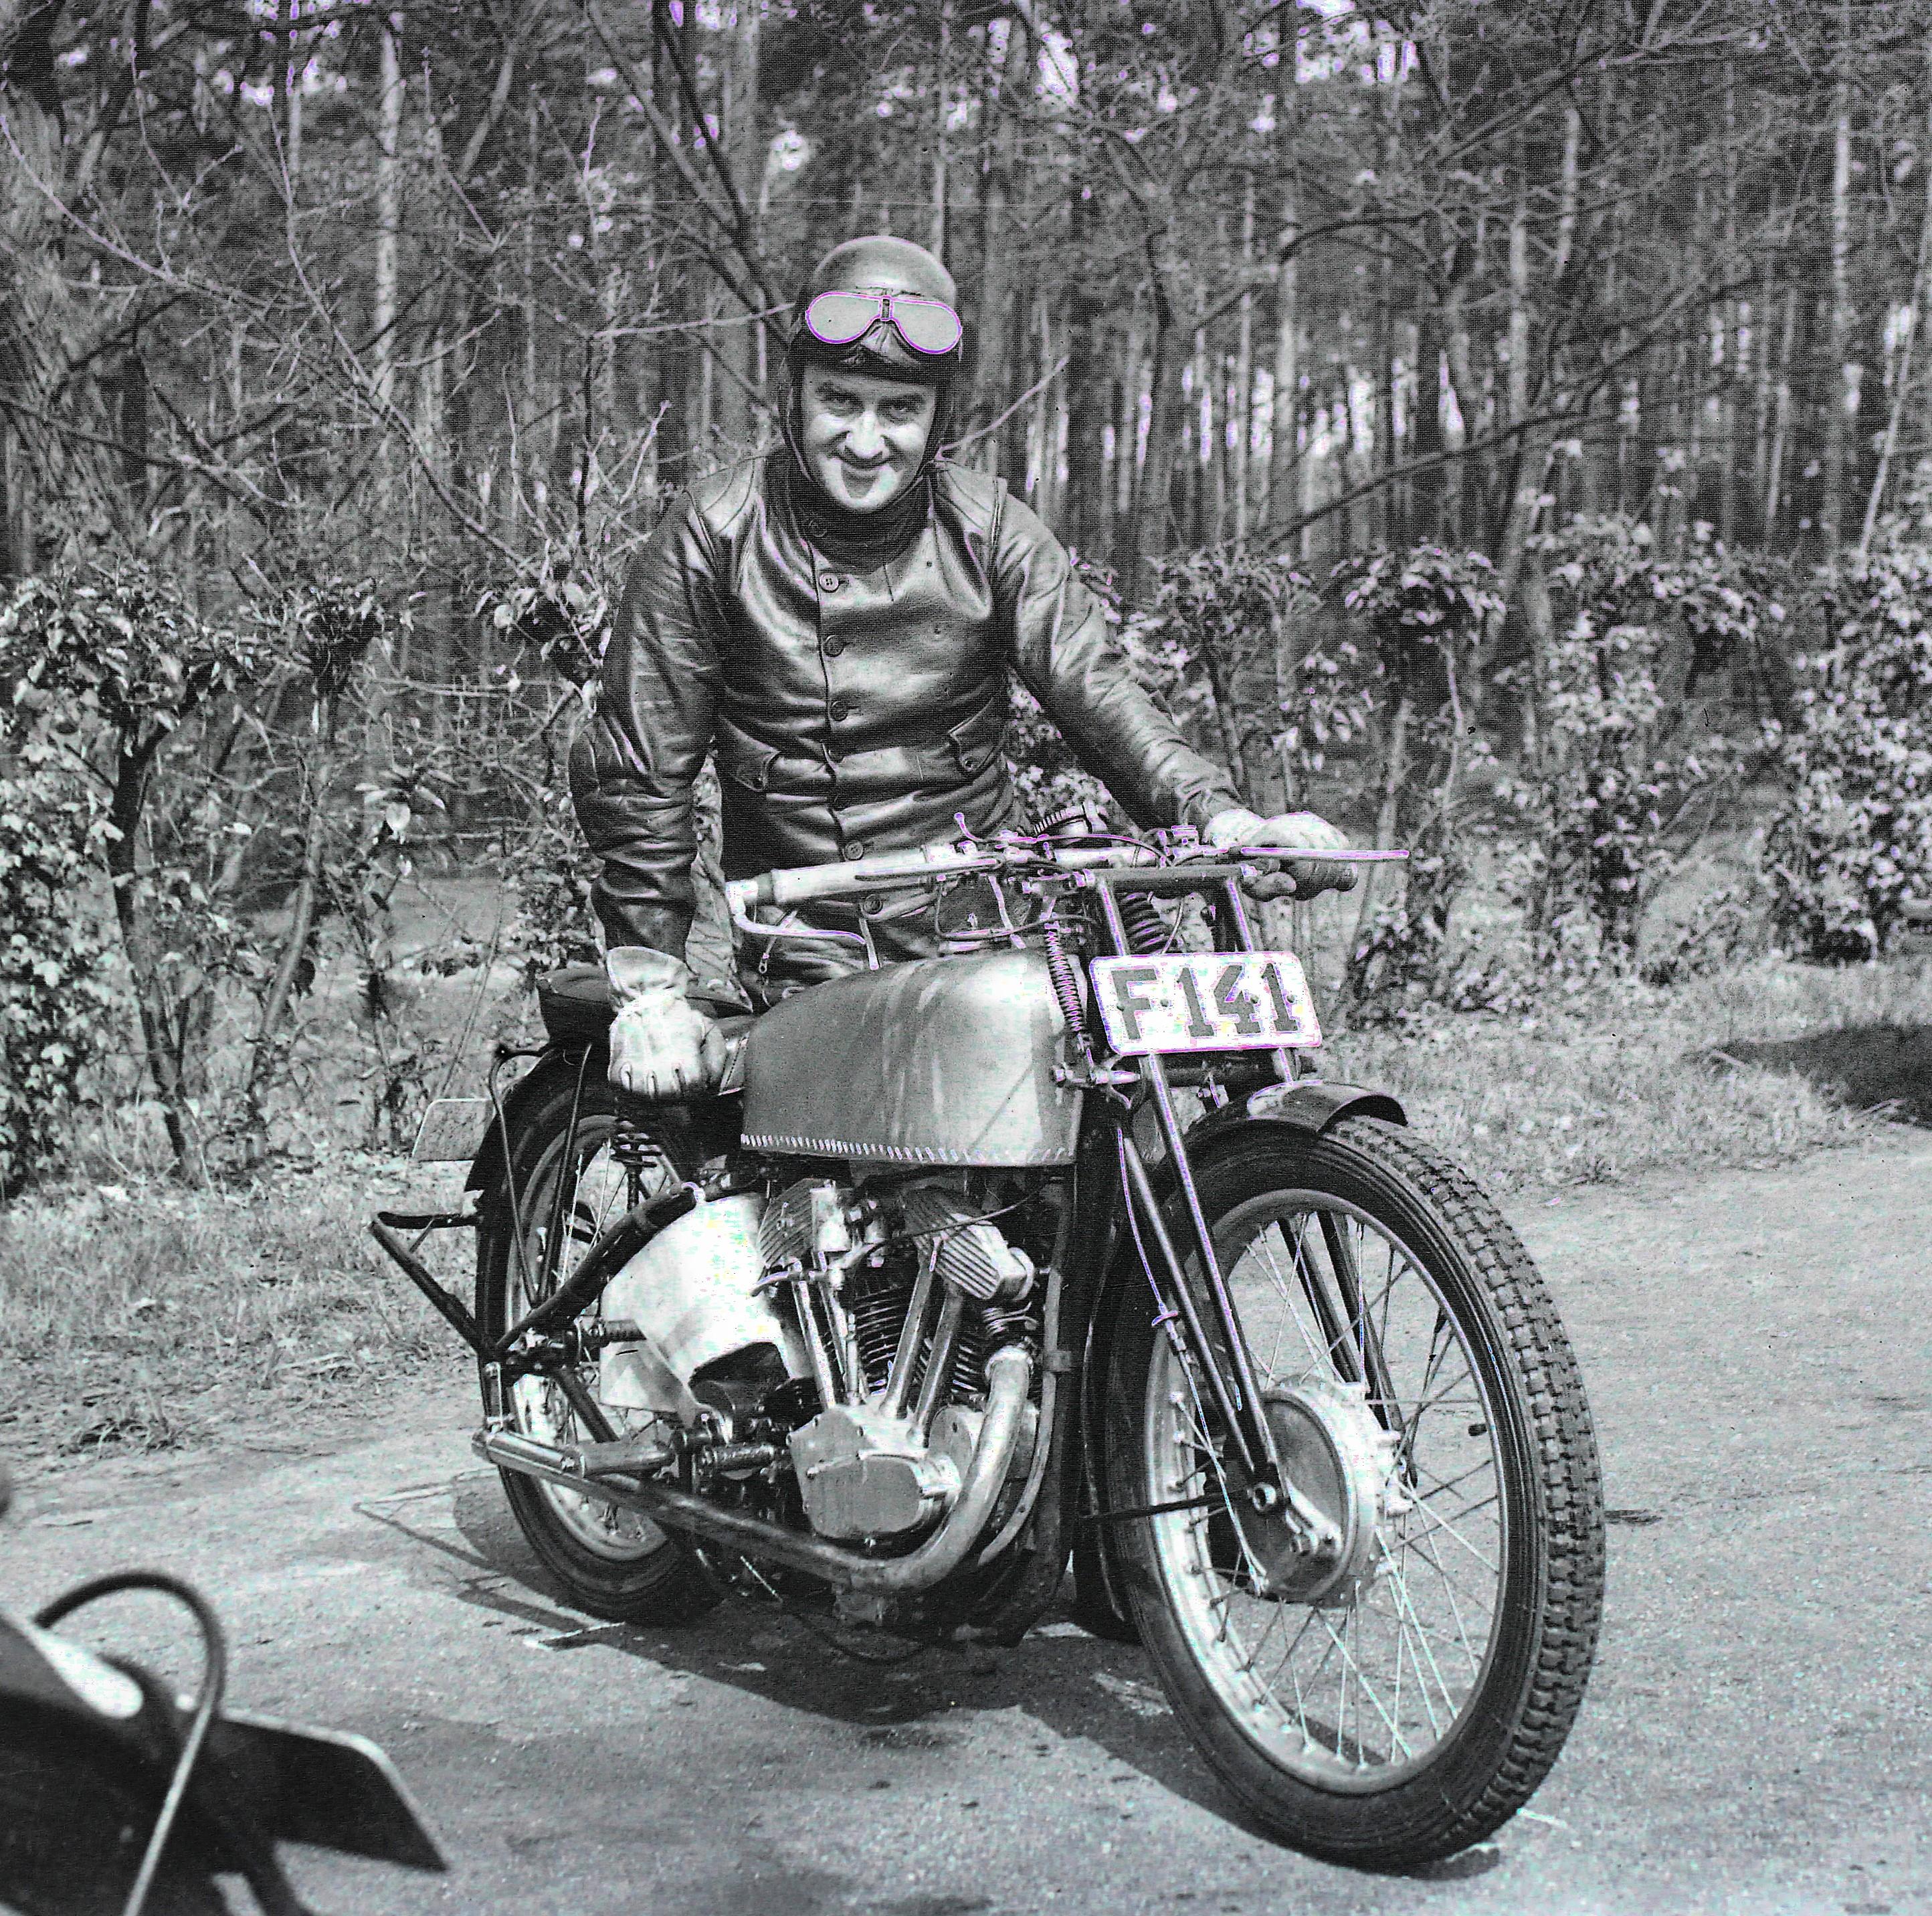 34_s_woods_hqv_500cc Povestea legendarului Stanley Woods - Husqvarna